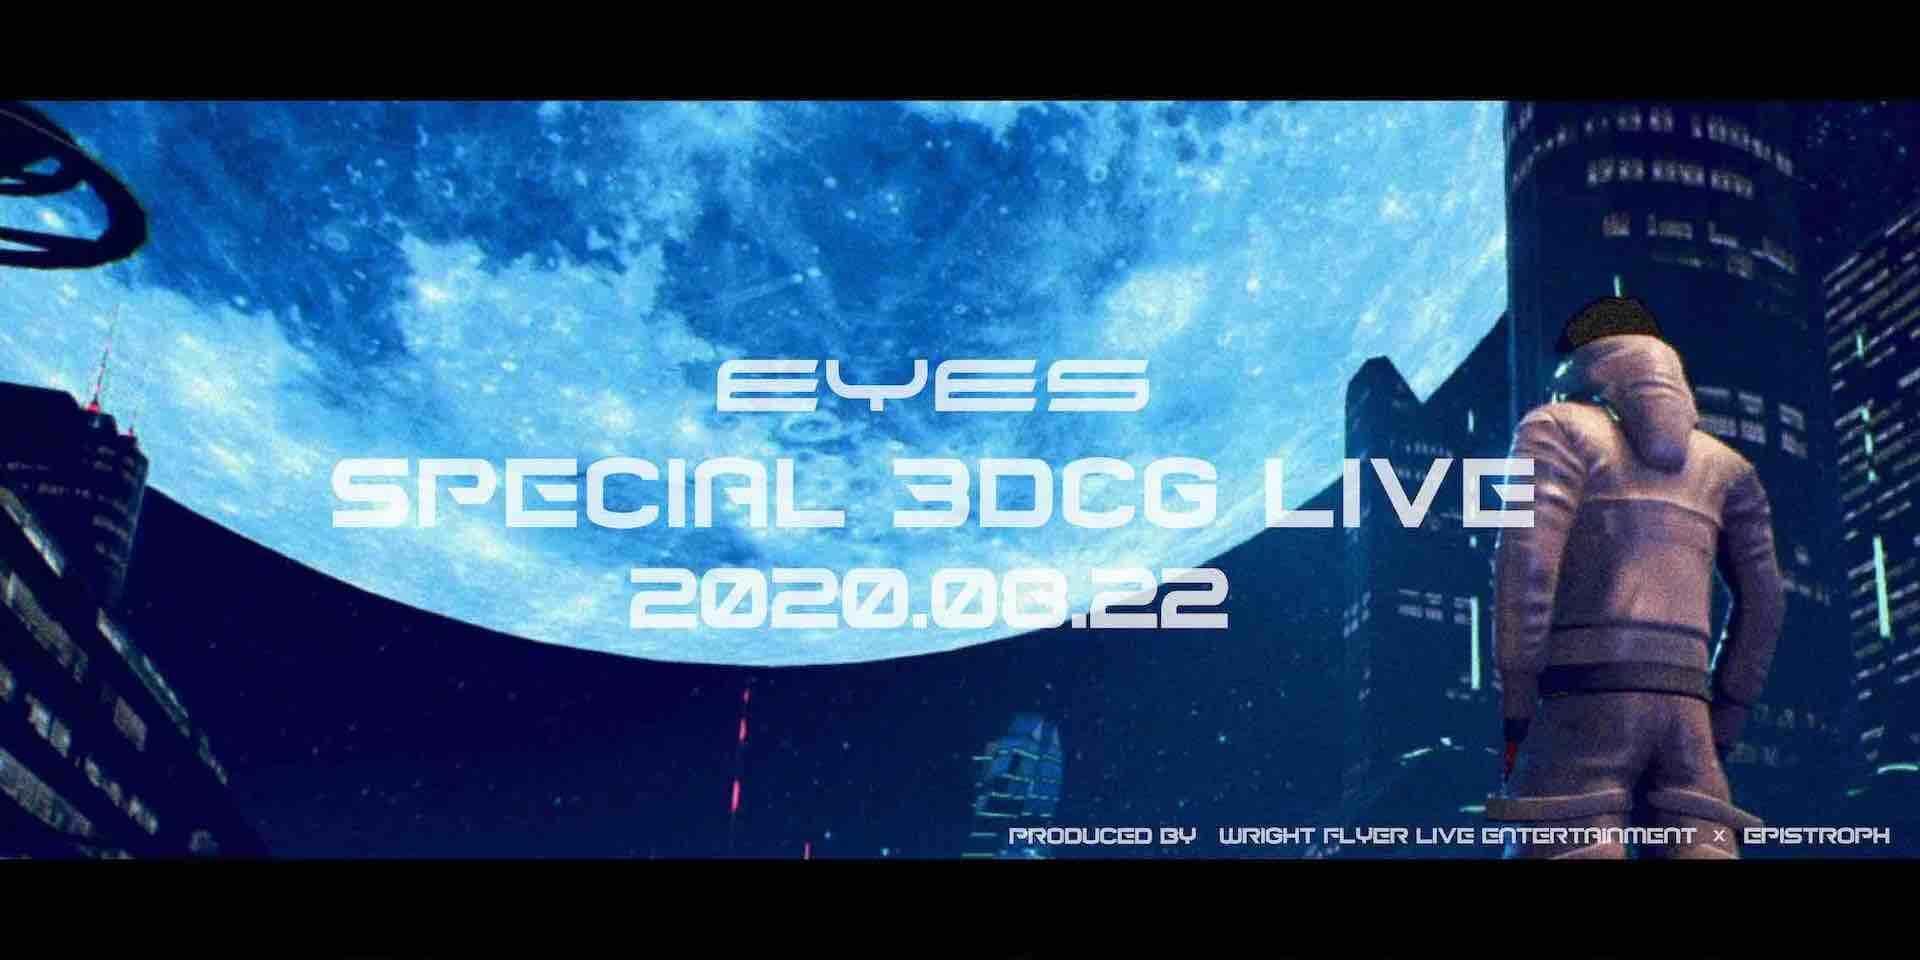 WONK最新作『EYES』の発売記念3DCGライブ<EYES SPECIAL 3DCG LIVE>の詳細が発表!ティーザー映像も公開 music200713_wonk_3-1920x960